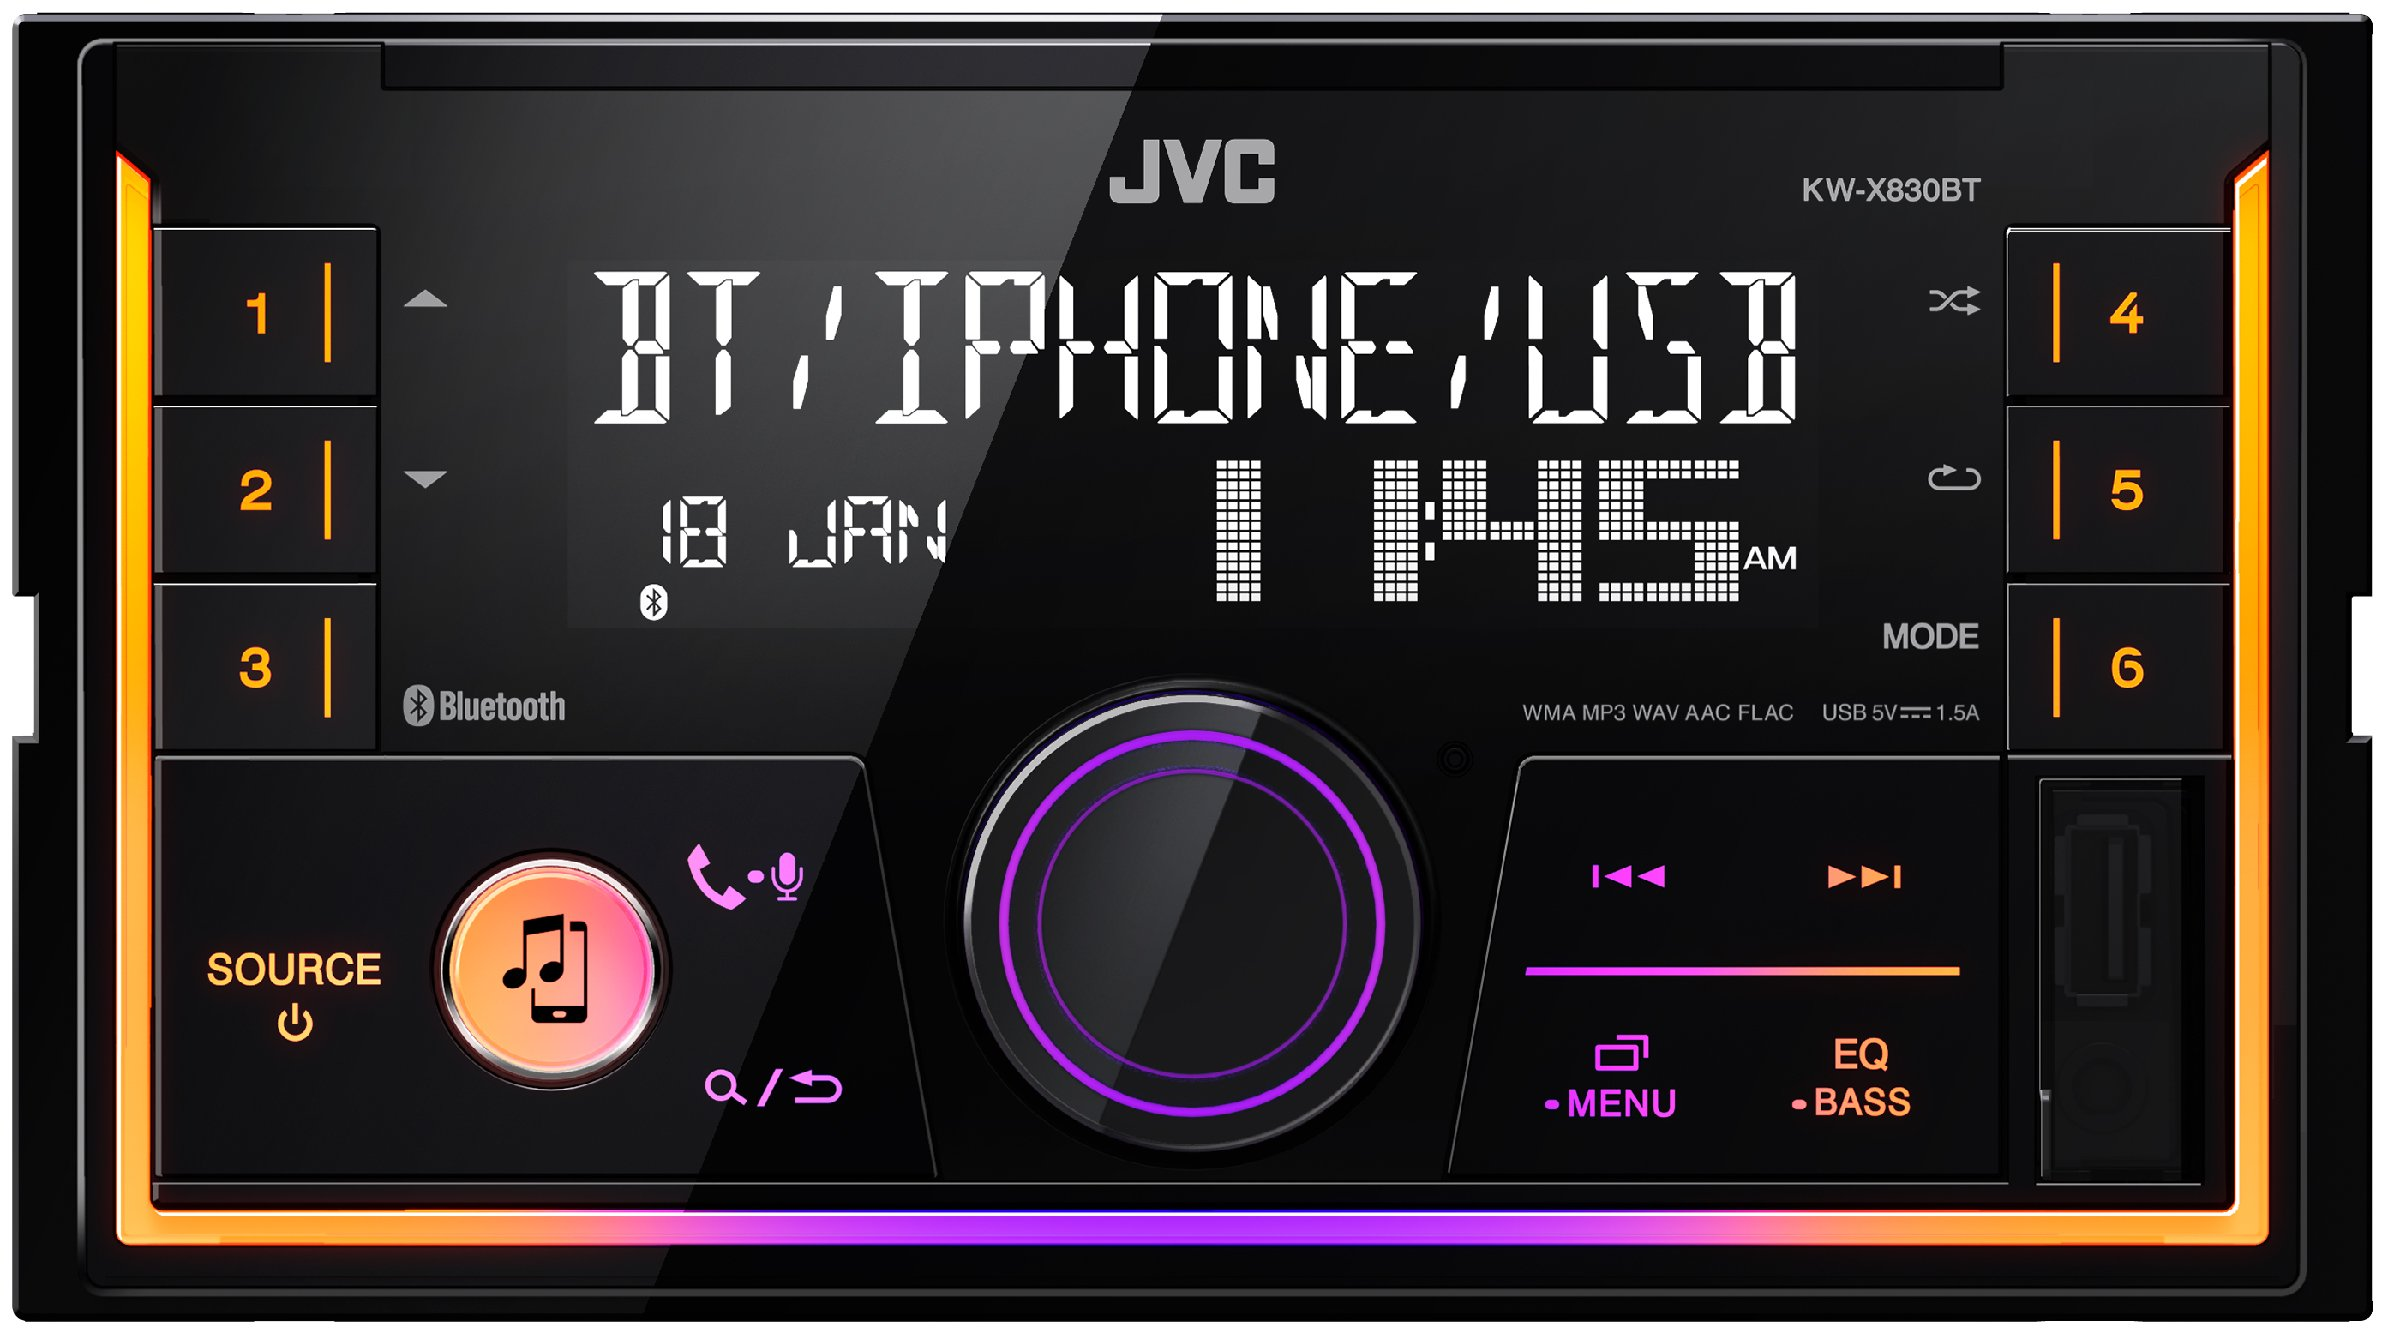 JVC-Doppel-DIN-Receiver